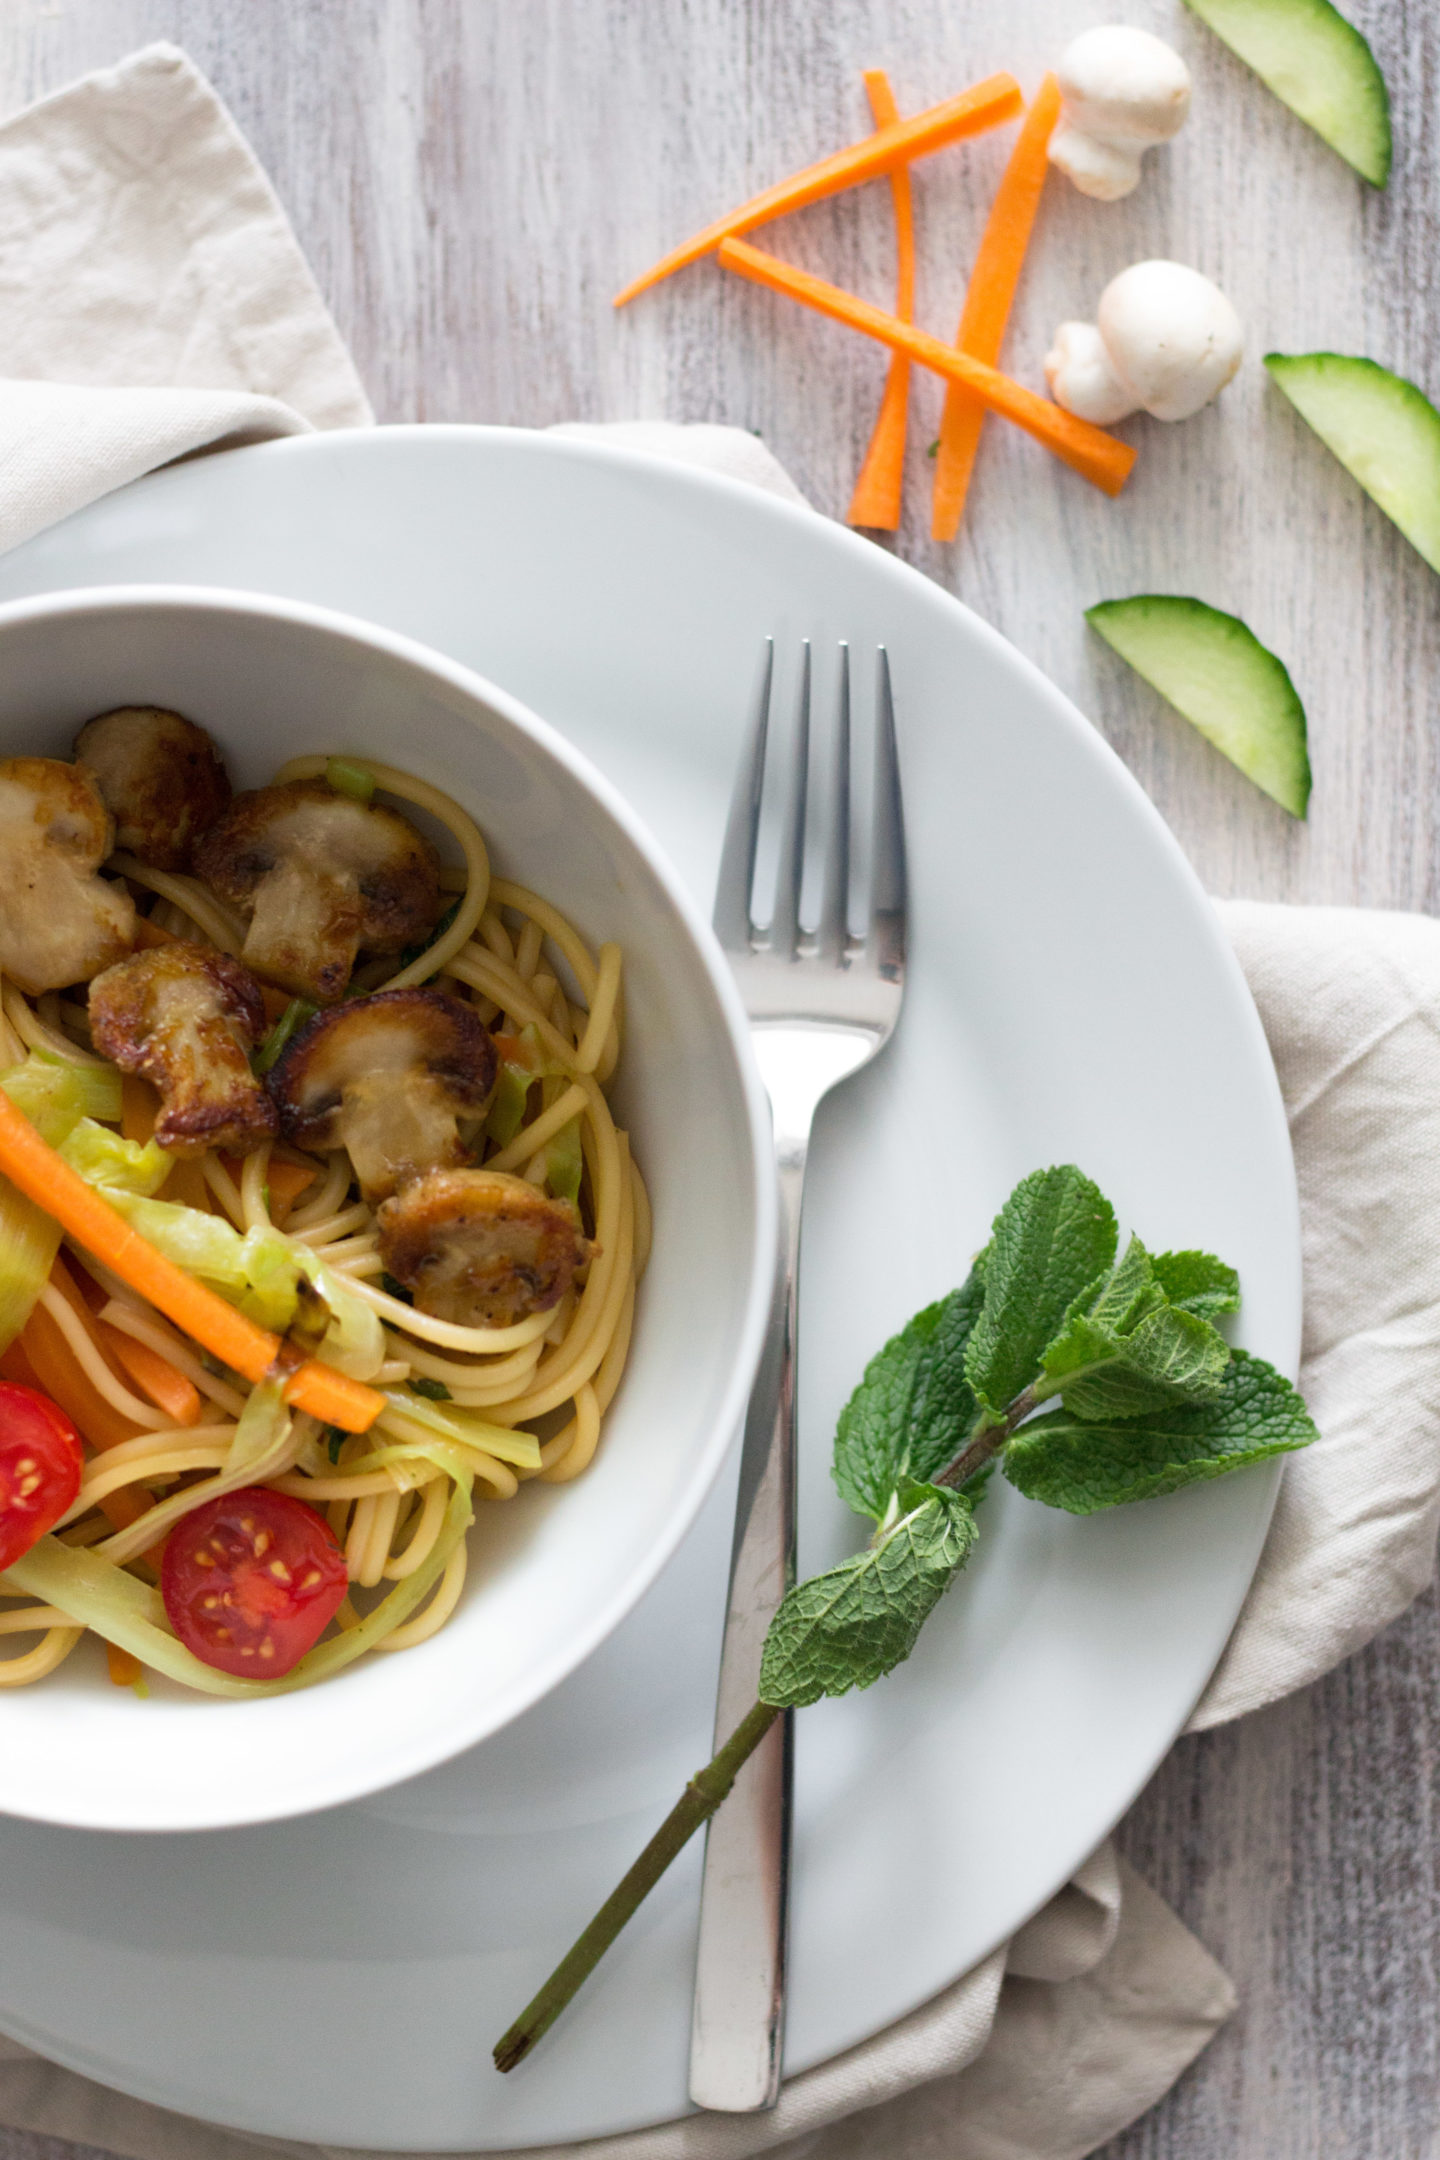 Vegane Spring Bowl mit Pasta und geröstetem Frühlingsgemüse